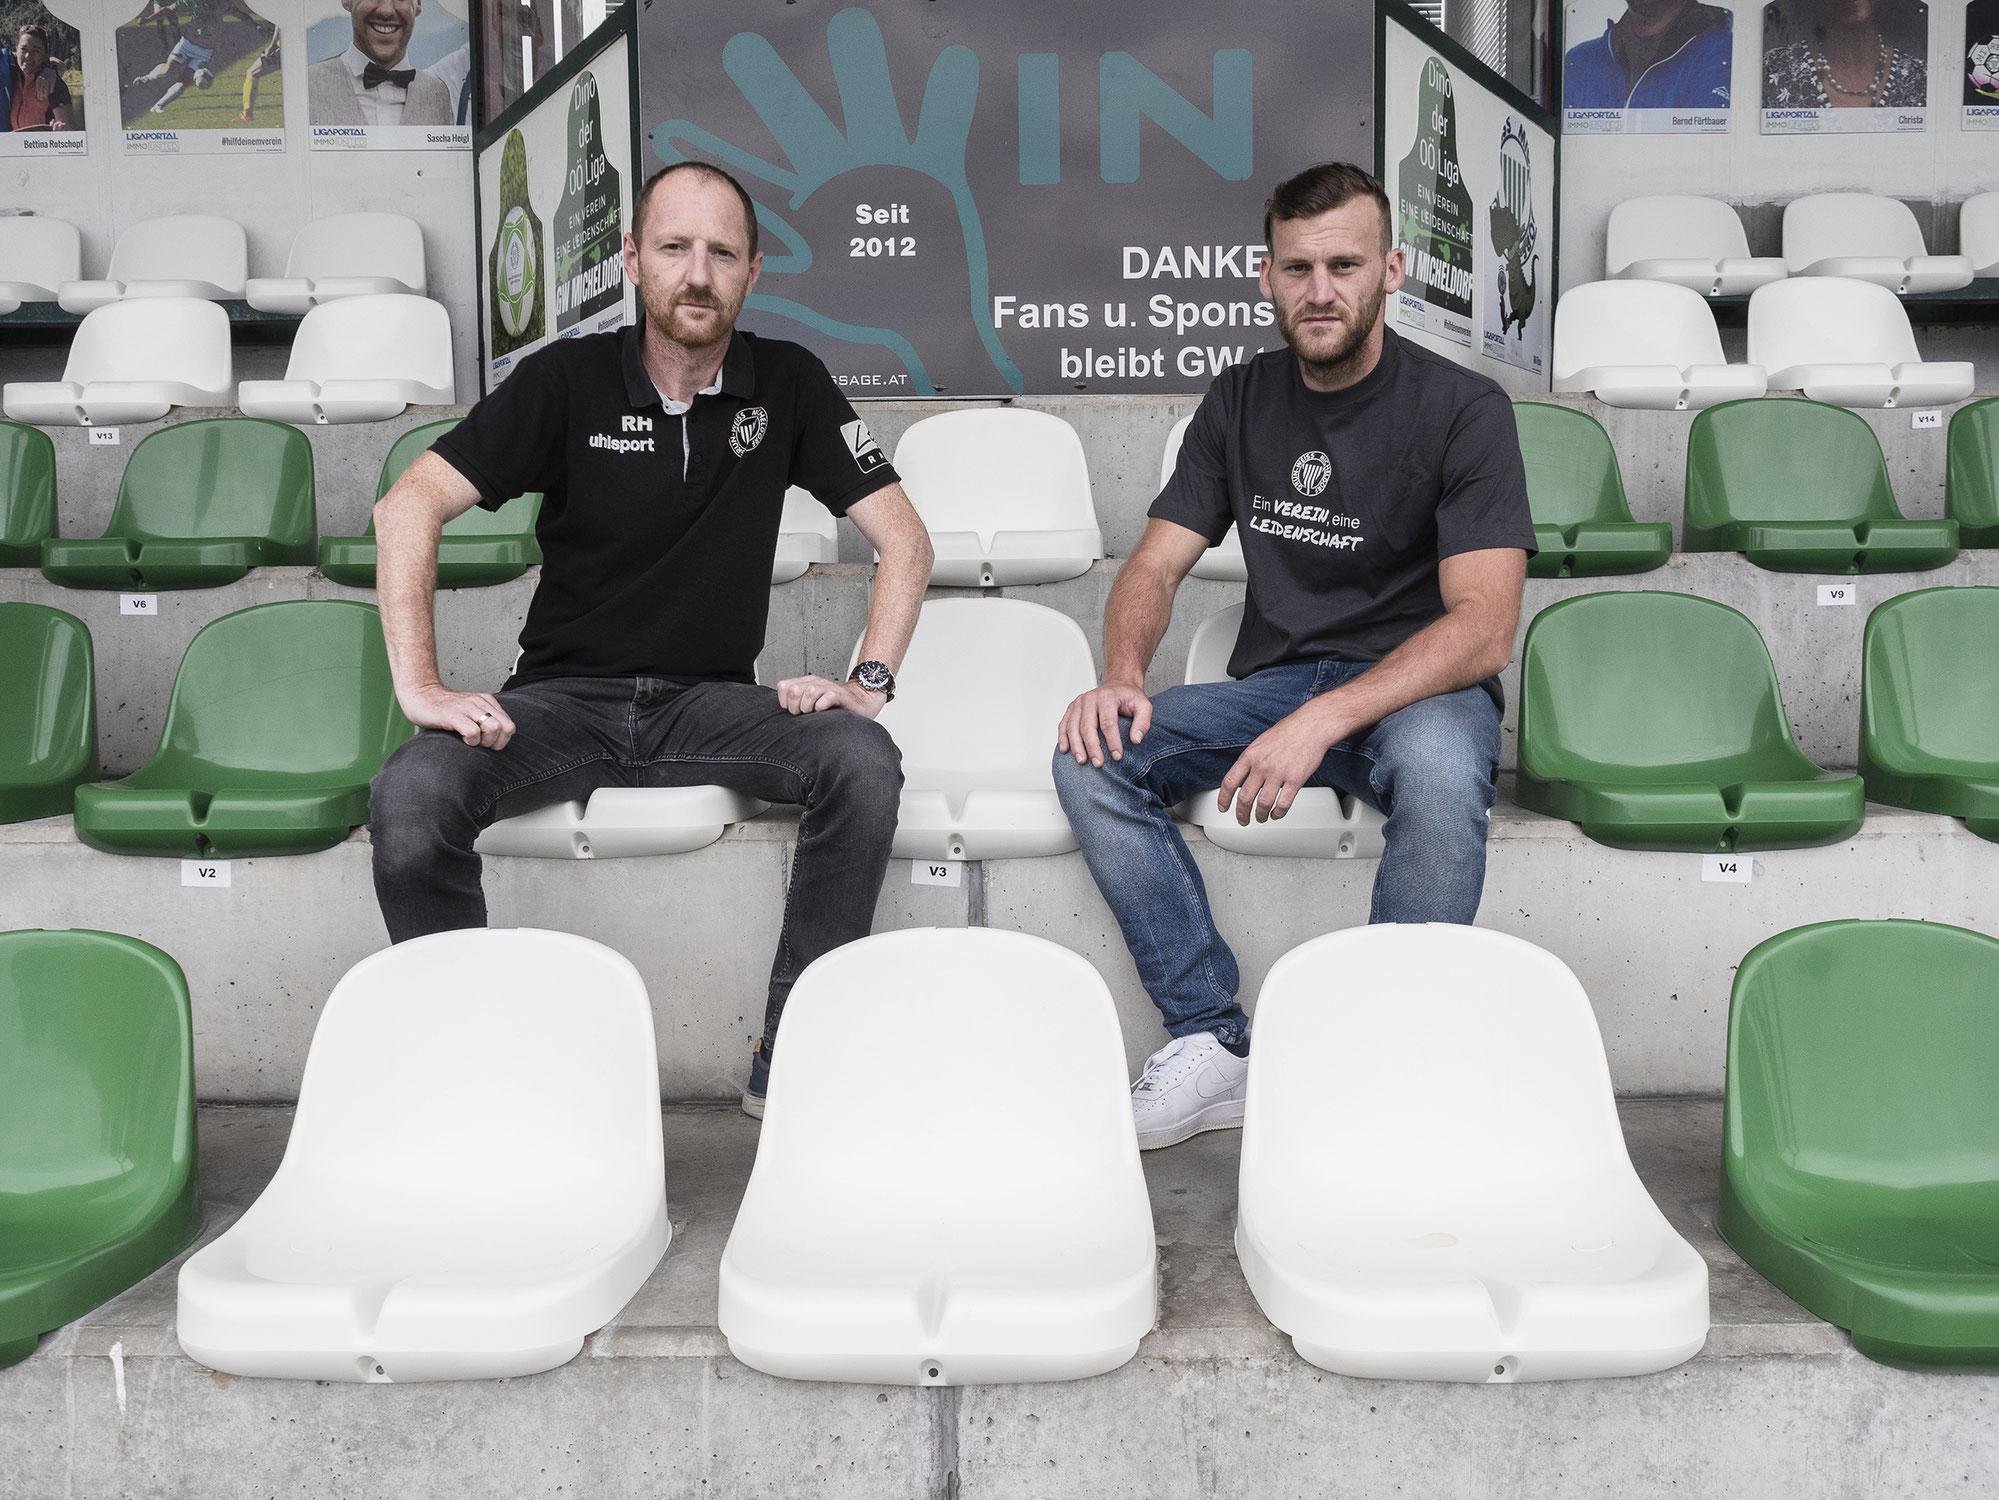 Hubert Zauner übernimmt den Trainerposten in Micheldorf